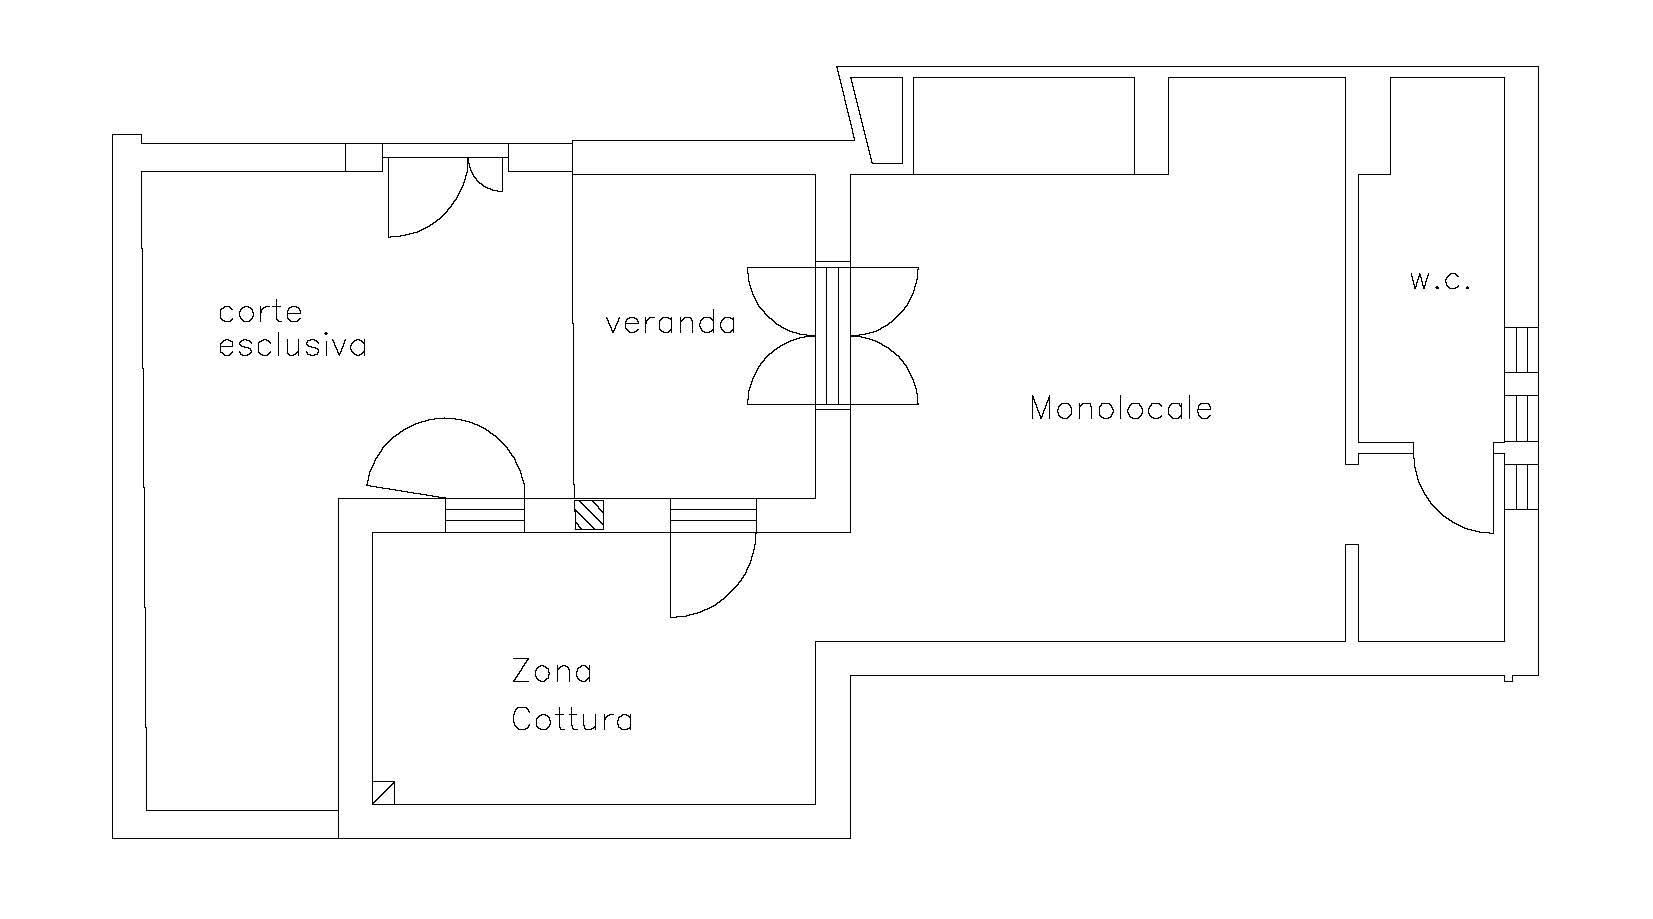 Monomaxi piano terra - Poseidon Residence - San Vito Lo Capo